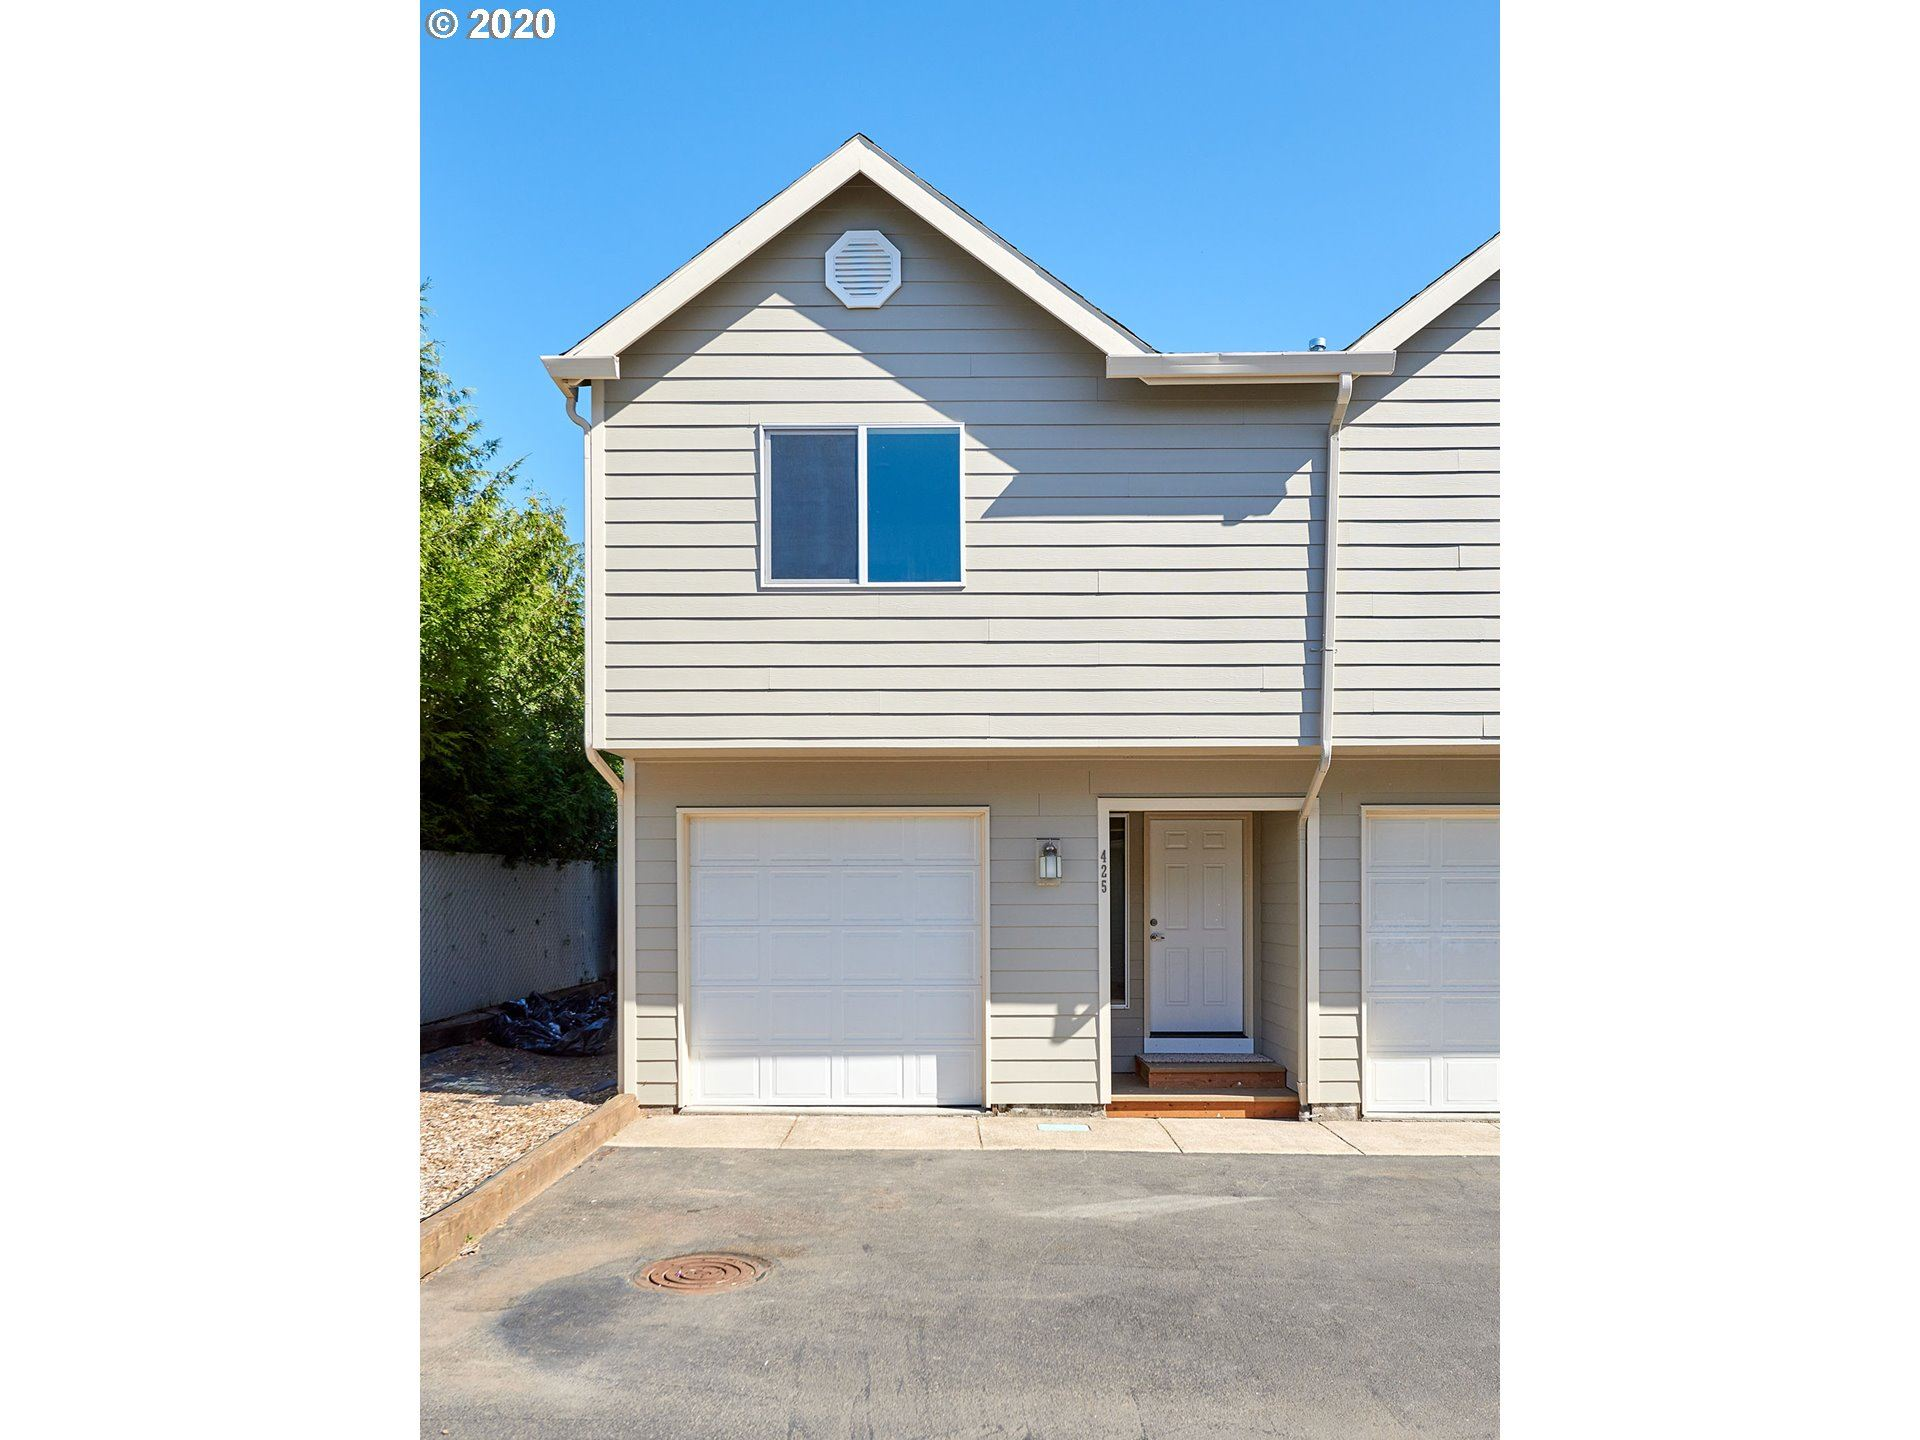 425 Harris LN, Oregon City, OR 97045 - MLS#: 20417246